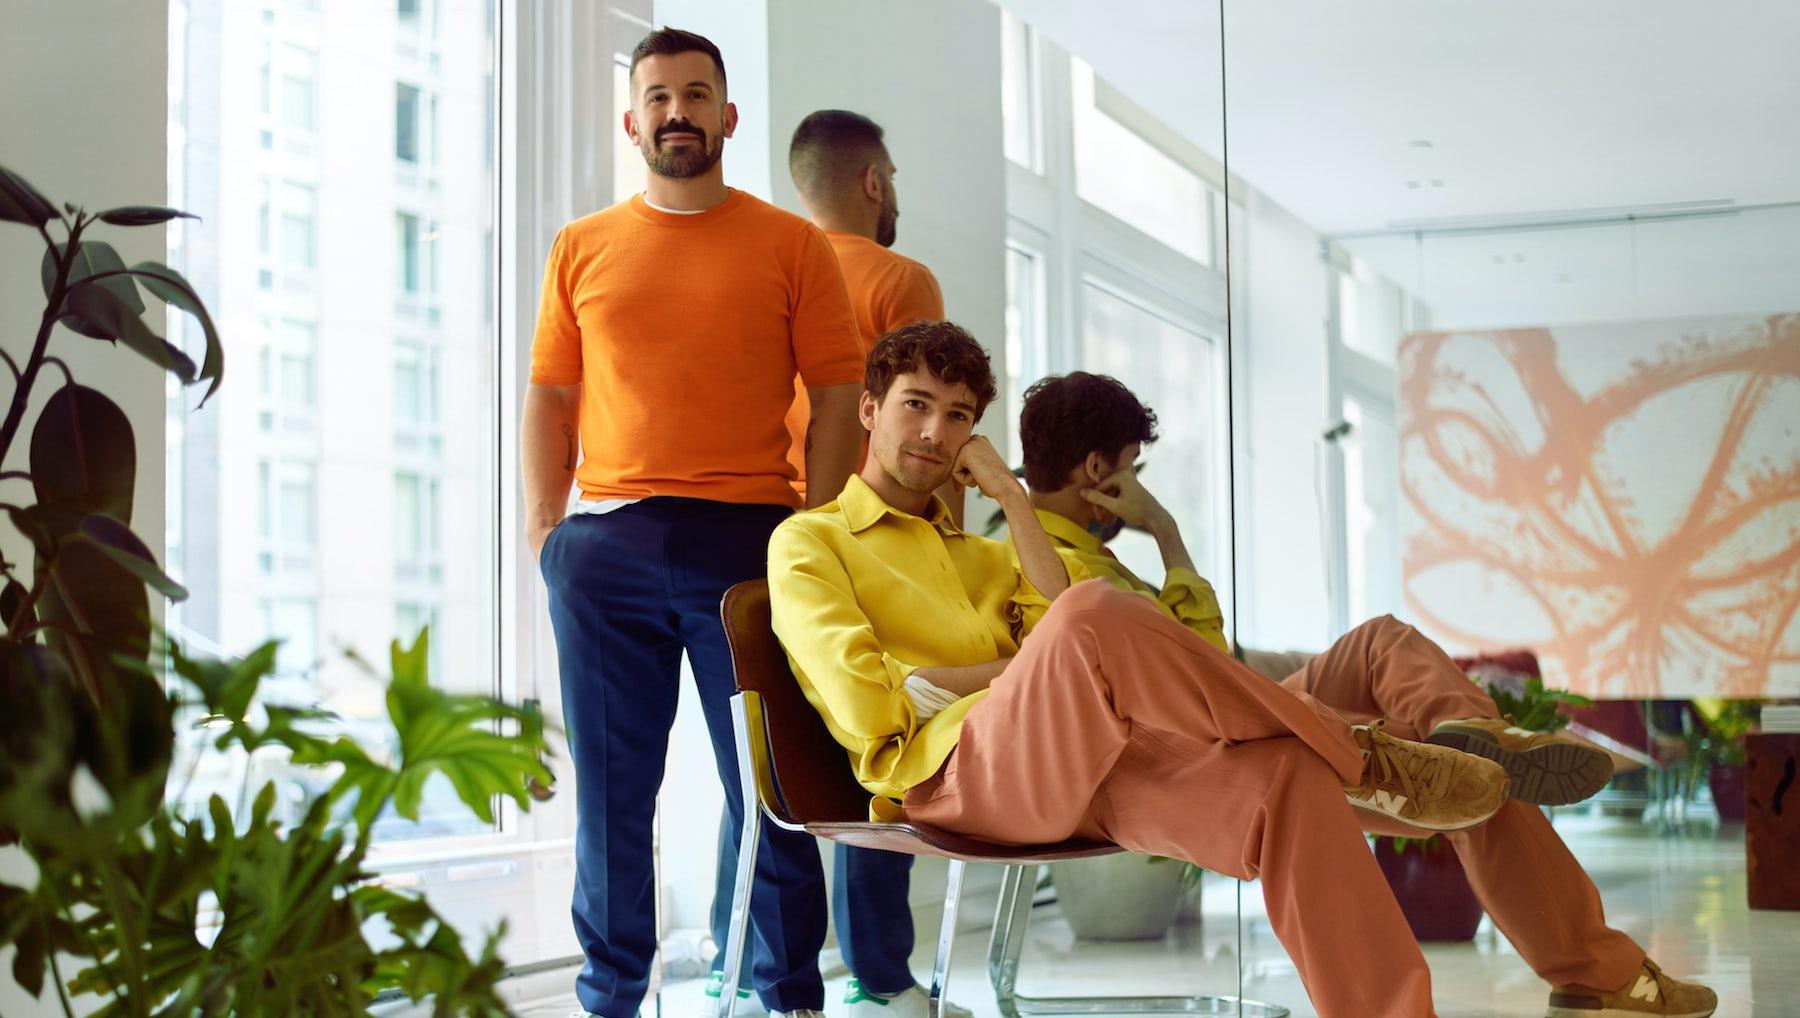 (L-R)  Joey Laurenti and Sander Lak in the Sies Marjan atelier | Photo: Richie Talboy for BoF